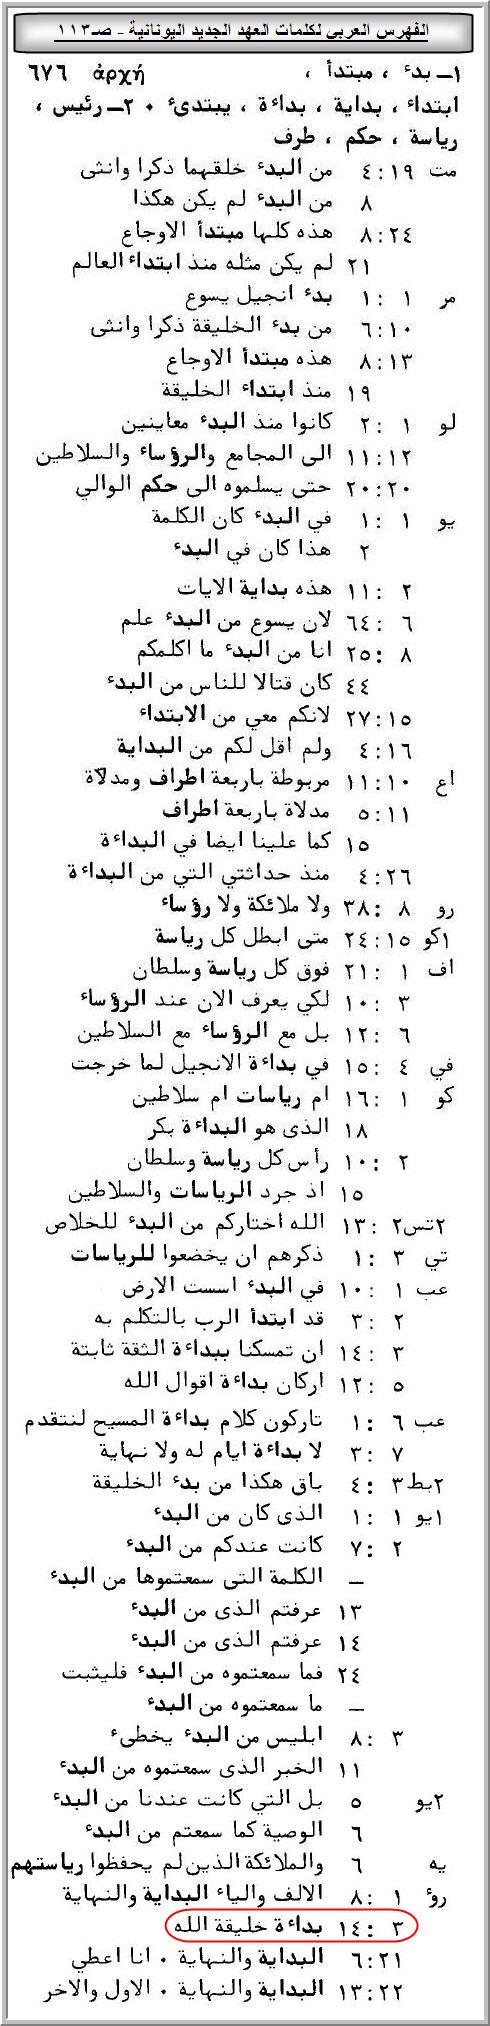 fahrs-arabi-kalemat-nt-greek_arche3